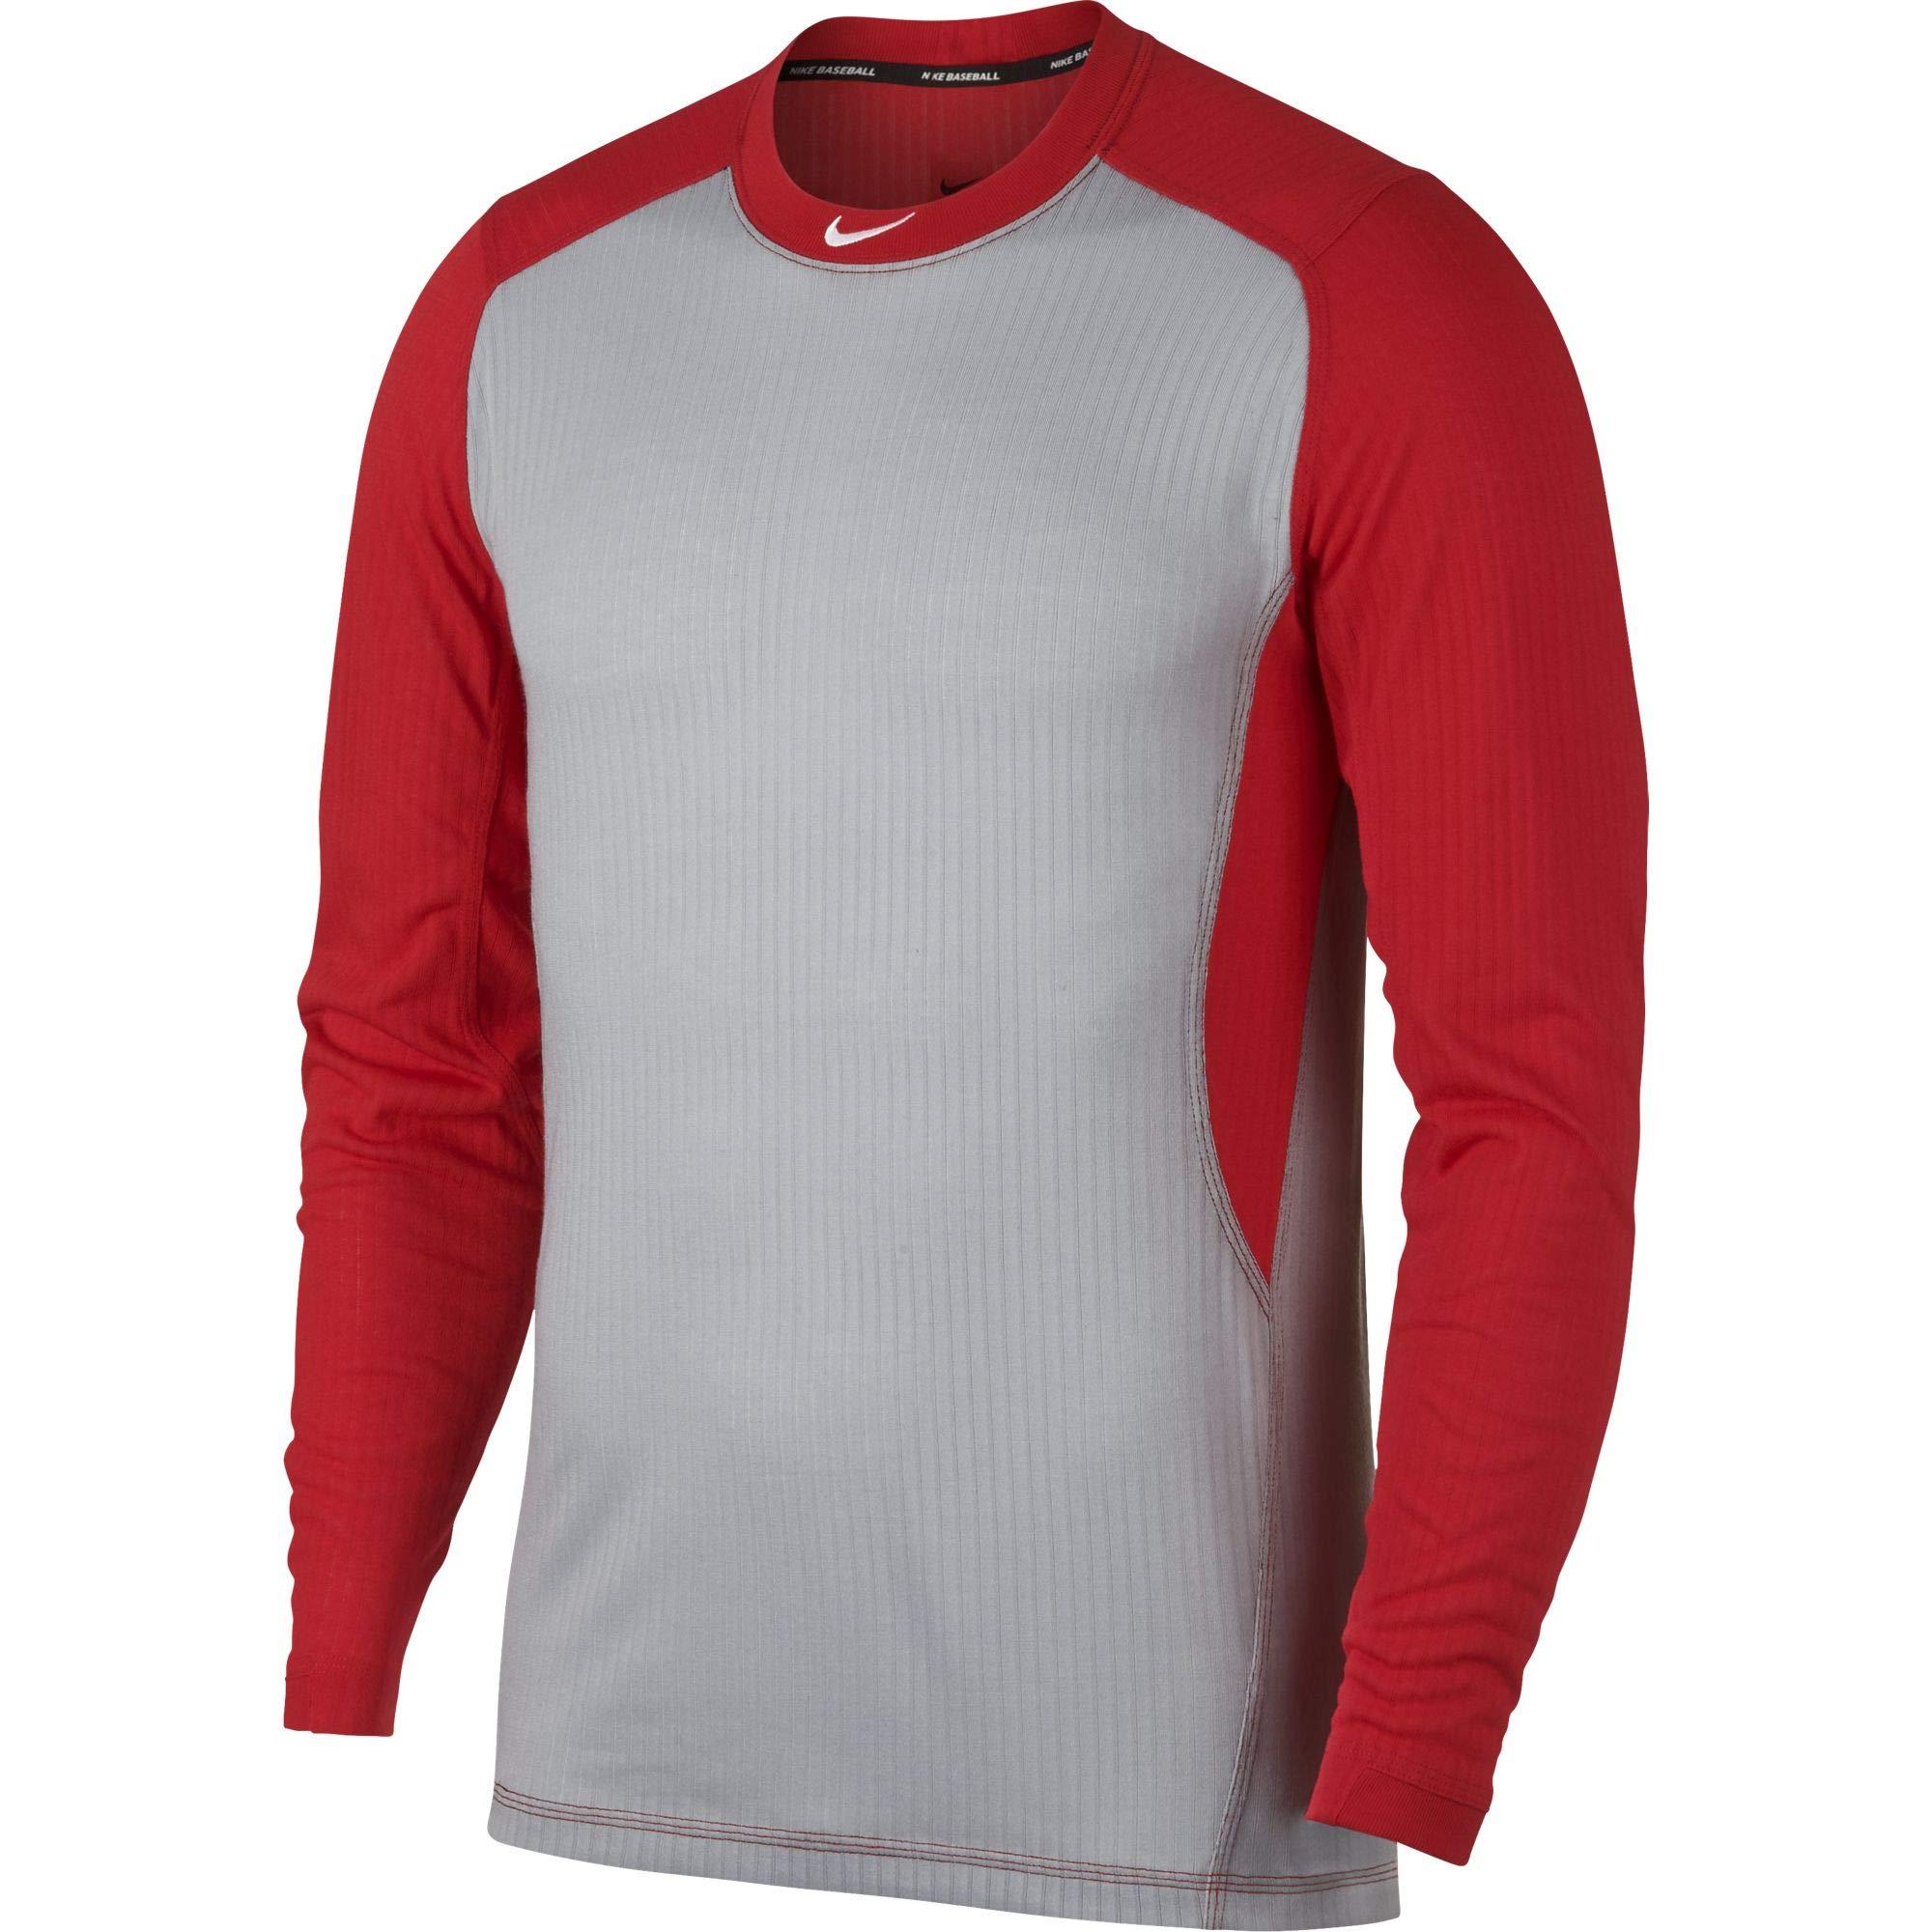 Nike Men's Long Sleeve Baseball Top Wolf Grey/University Red/White Size Medium